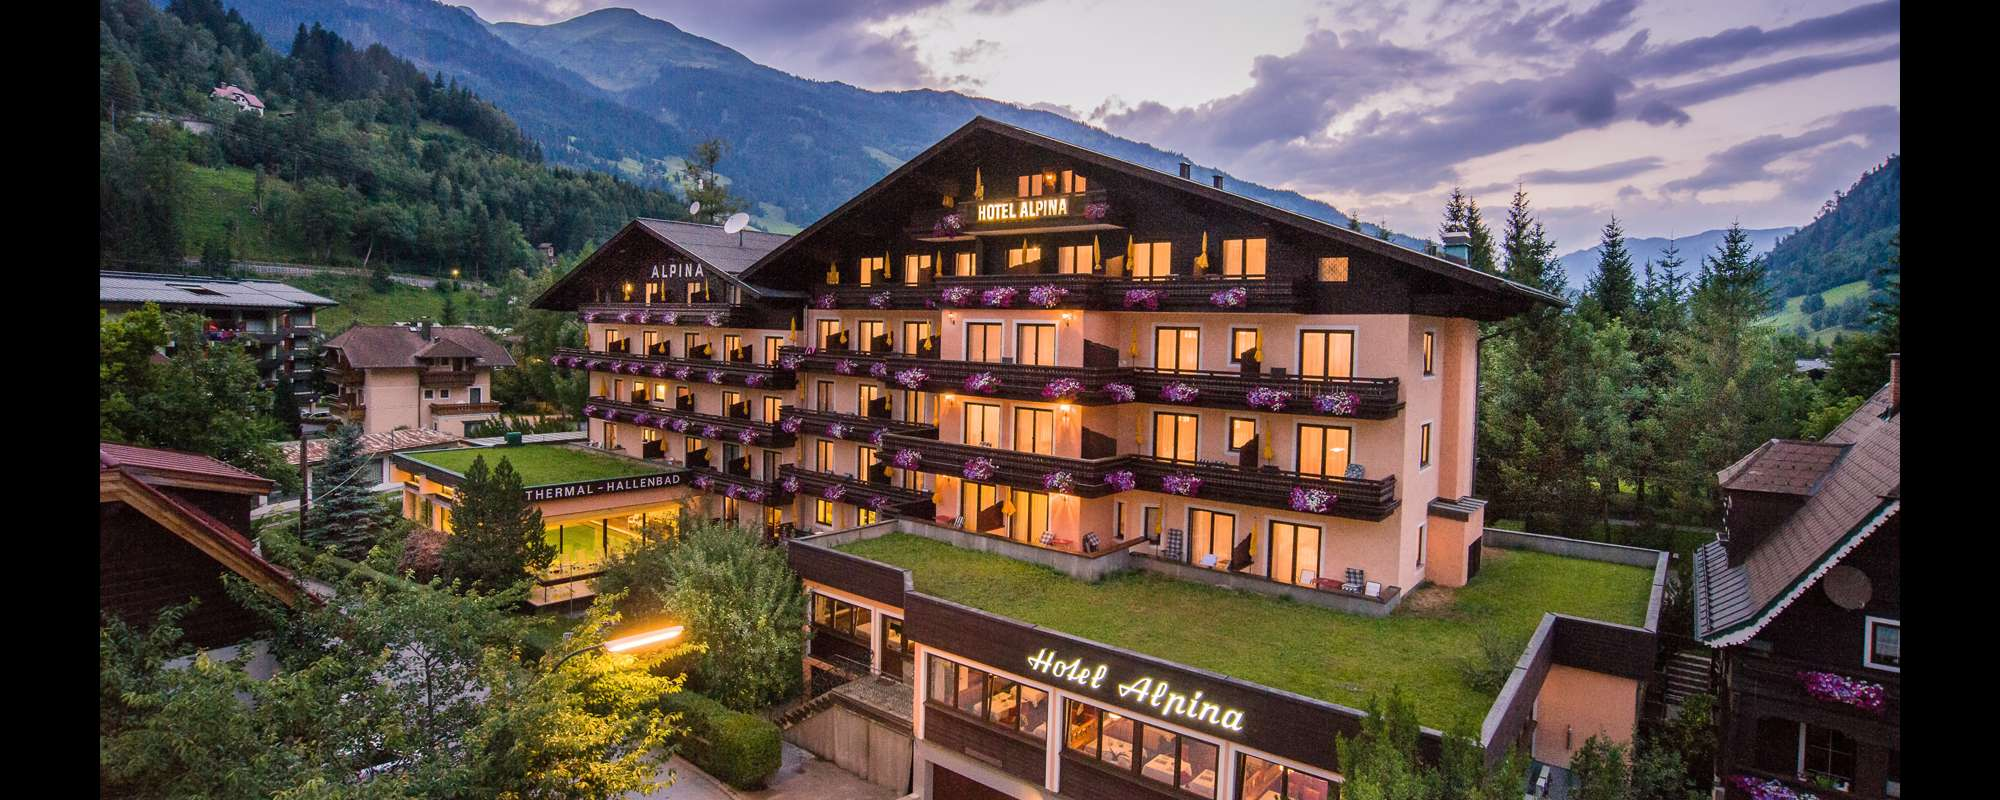 Hotel Alpina In Bad Hofgastein Skiing Holidays And Spa - Alpina hotel